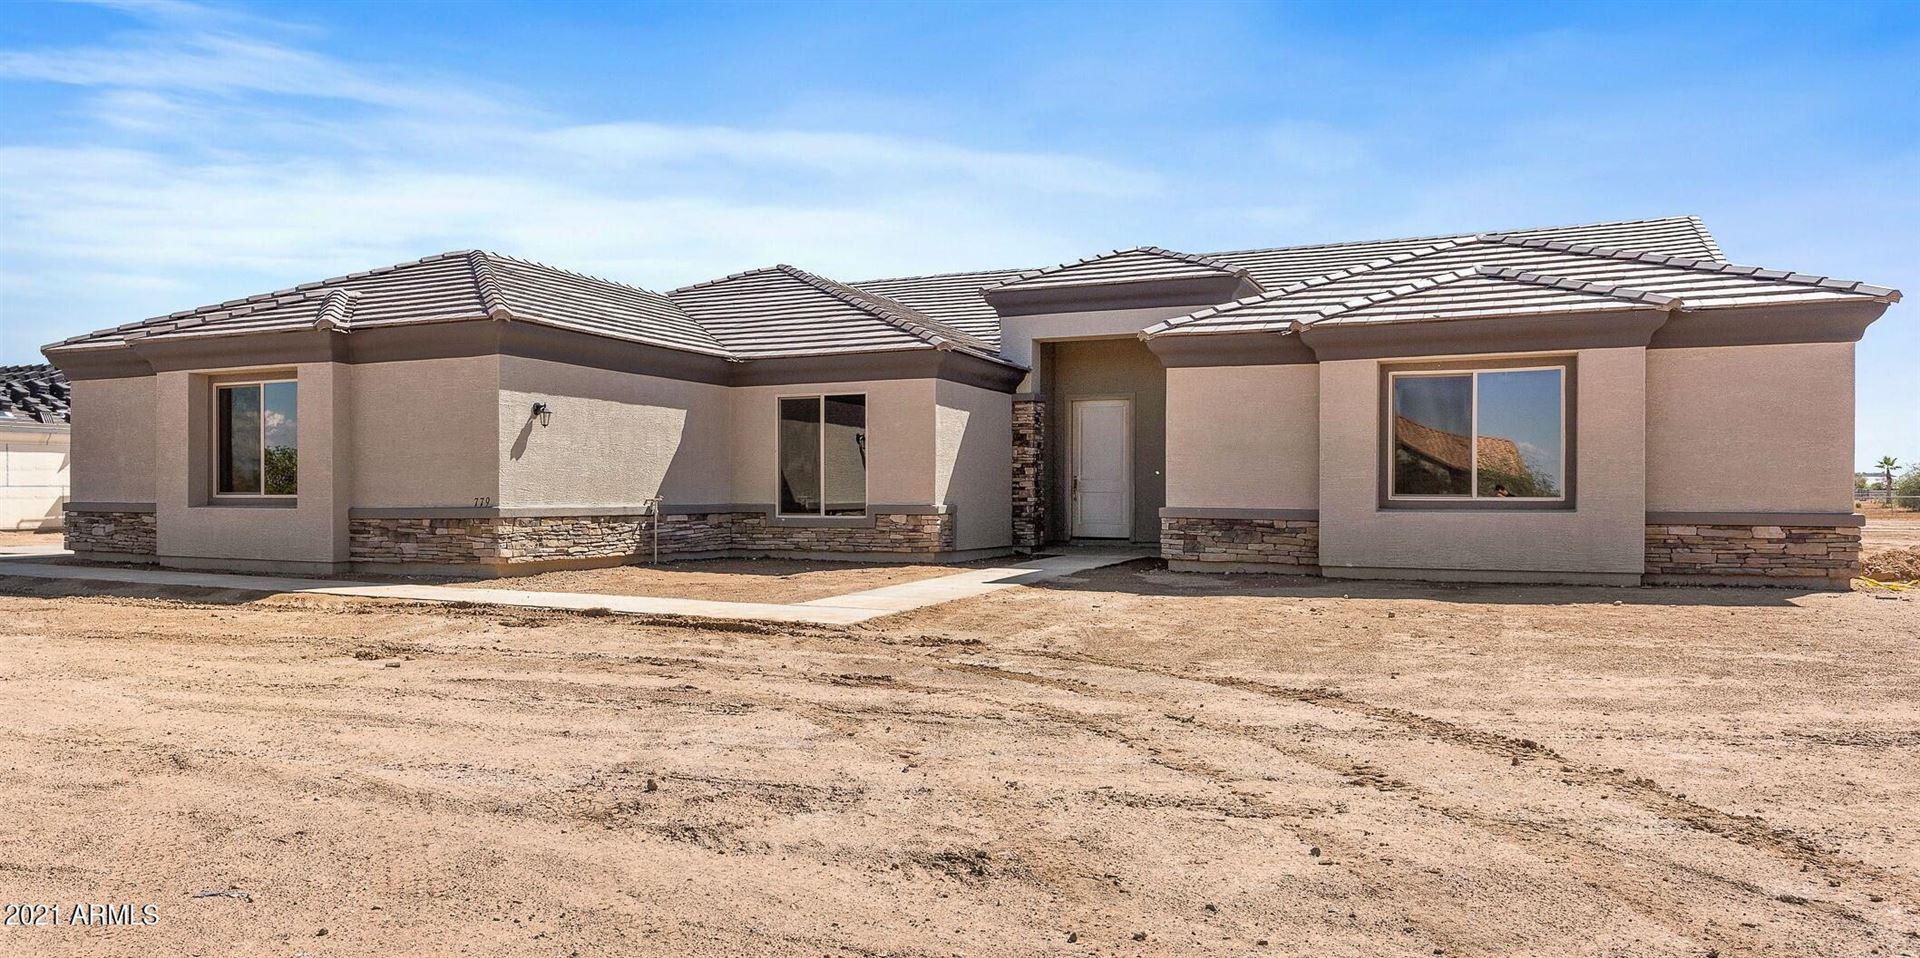 0000 W RHONDA VIEW -- #2, Queen Creek, AZ 85142 - #: 6087419